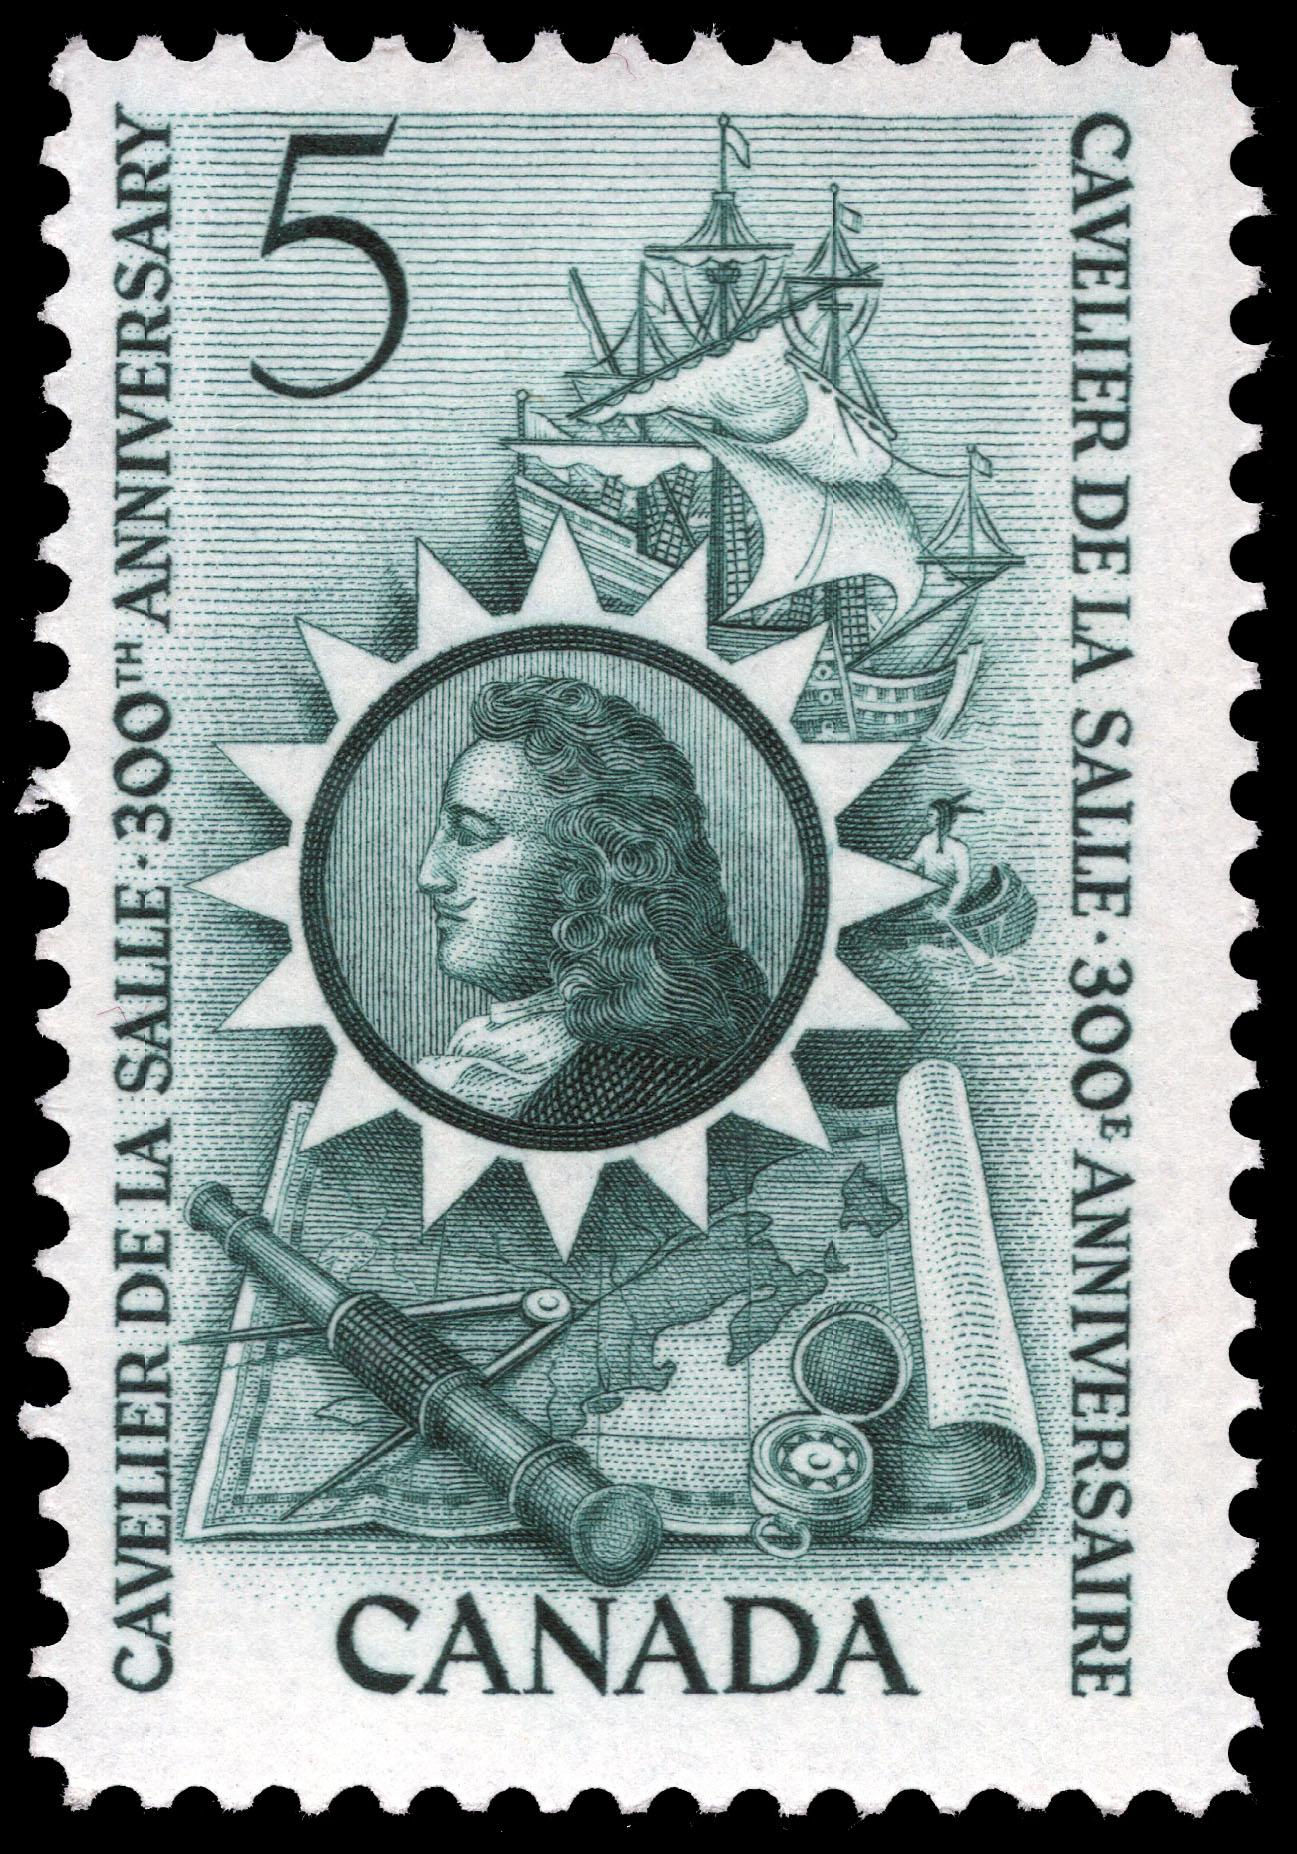 Cavelier de La Salle, 300th Anniversary Canada Postage Stamp